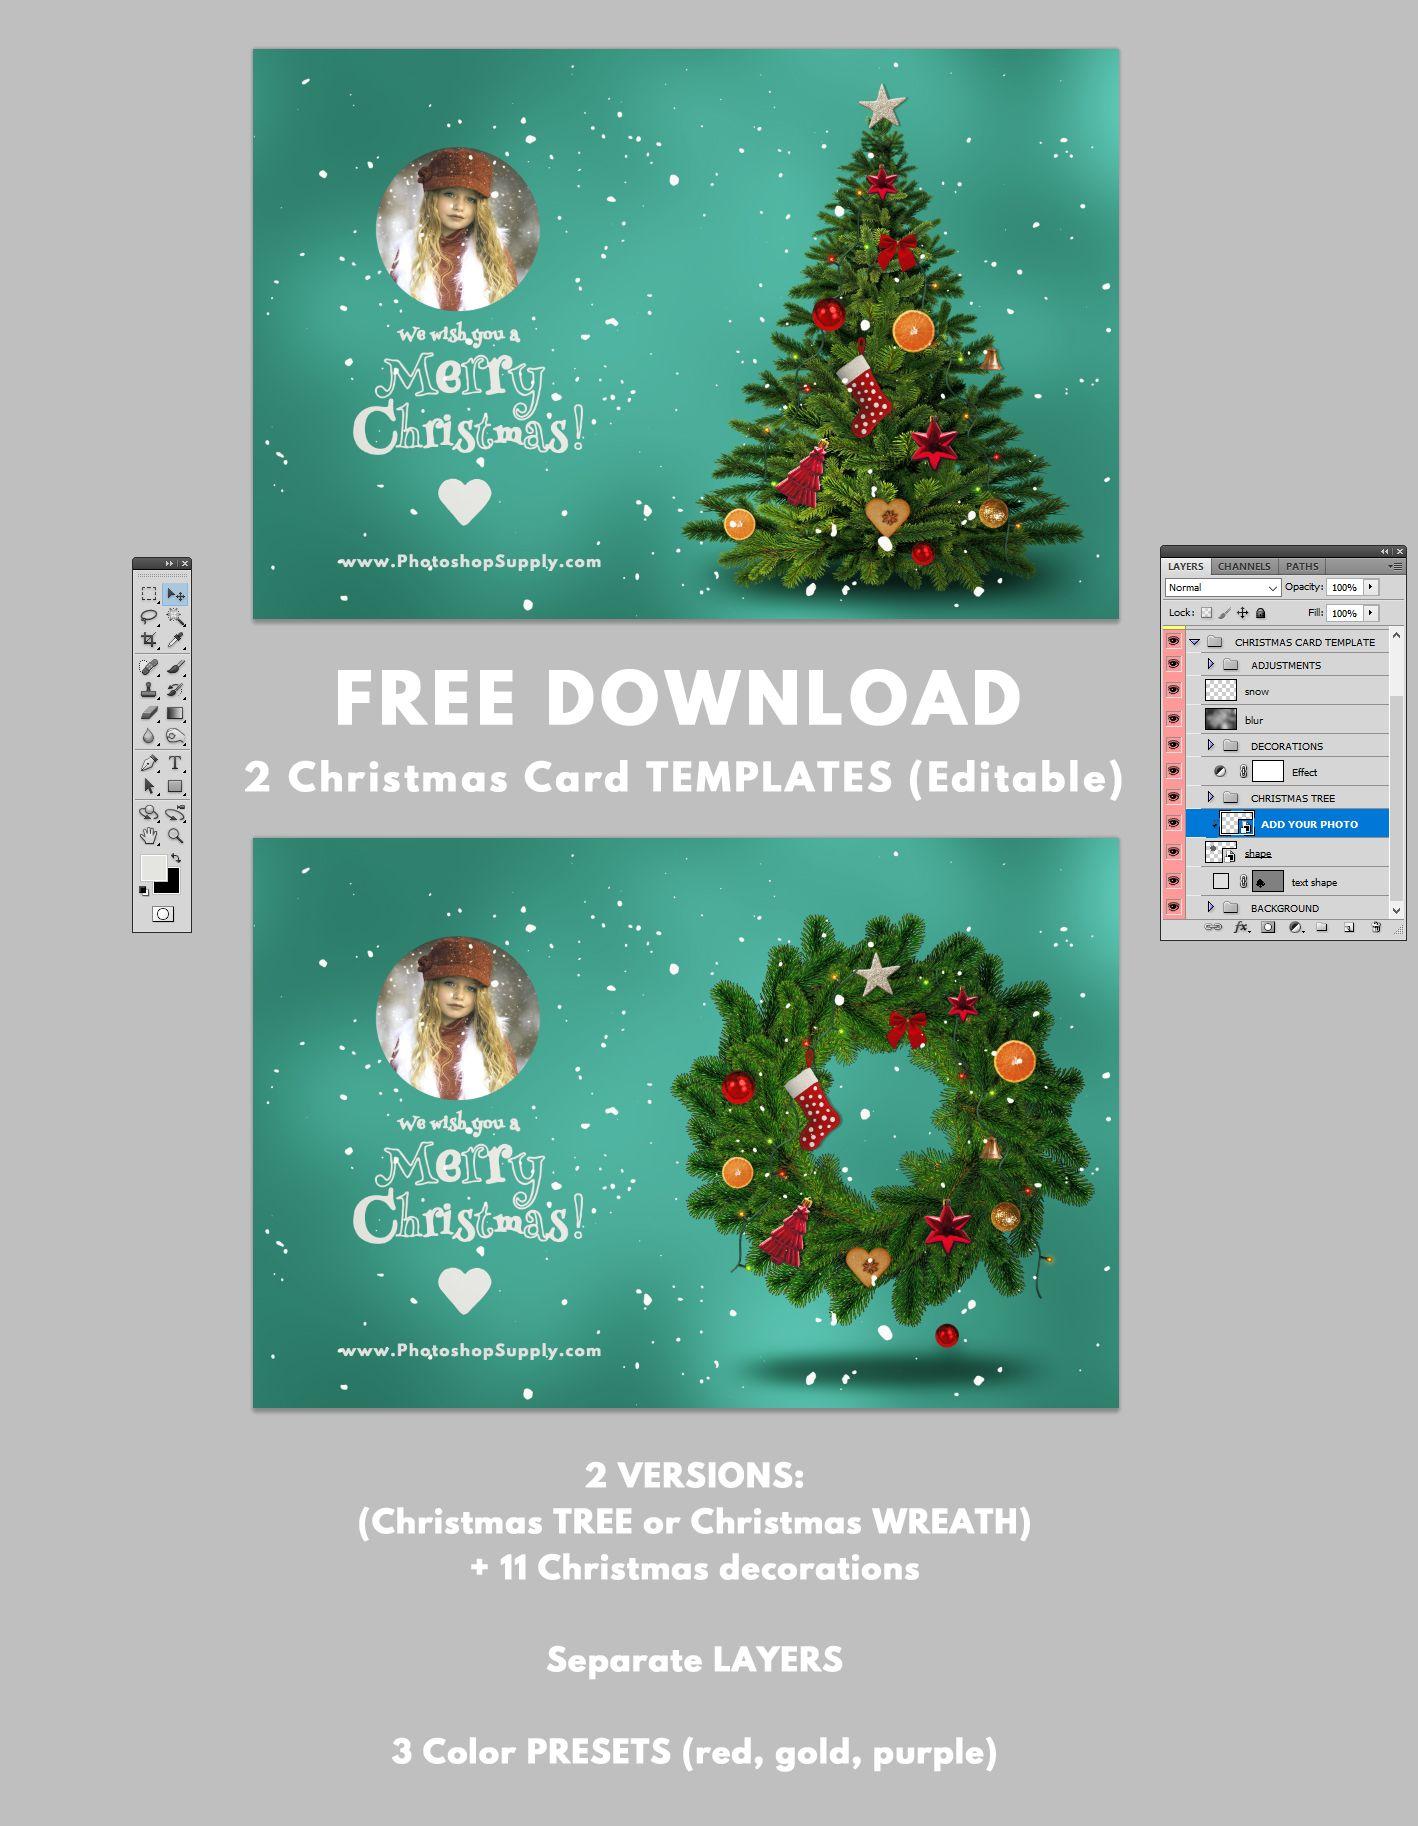 Christmas Card Templates For Photoshop Photoshop Supply Christmas Card Templates Free Photoshop Christmas Card Template Christmas Templates Free